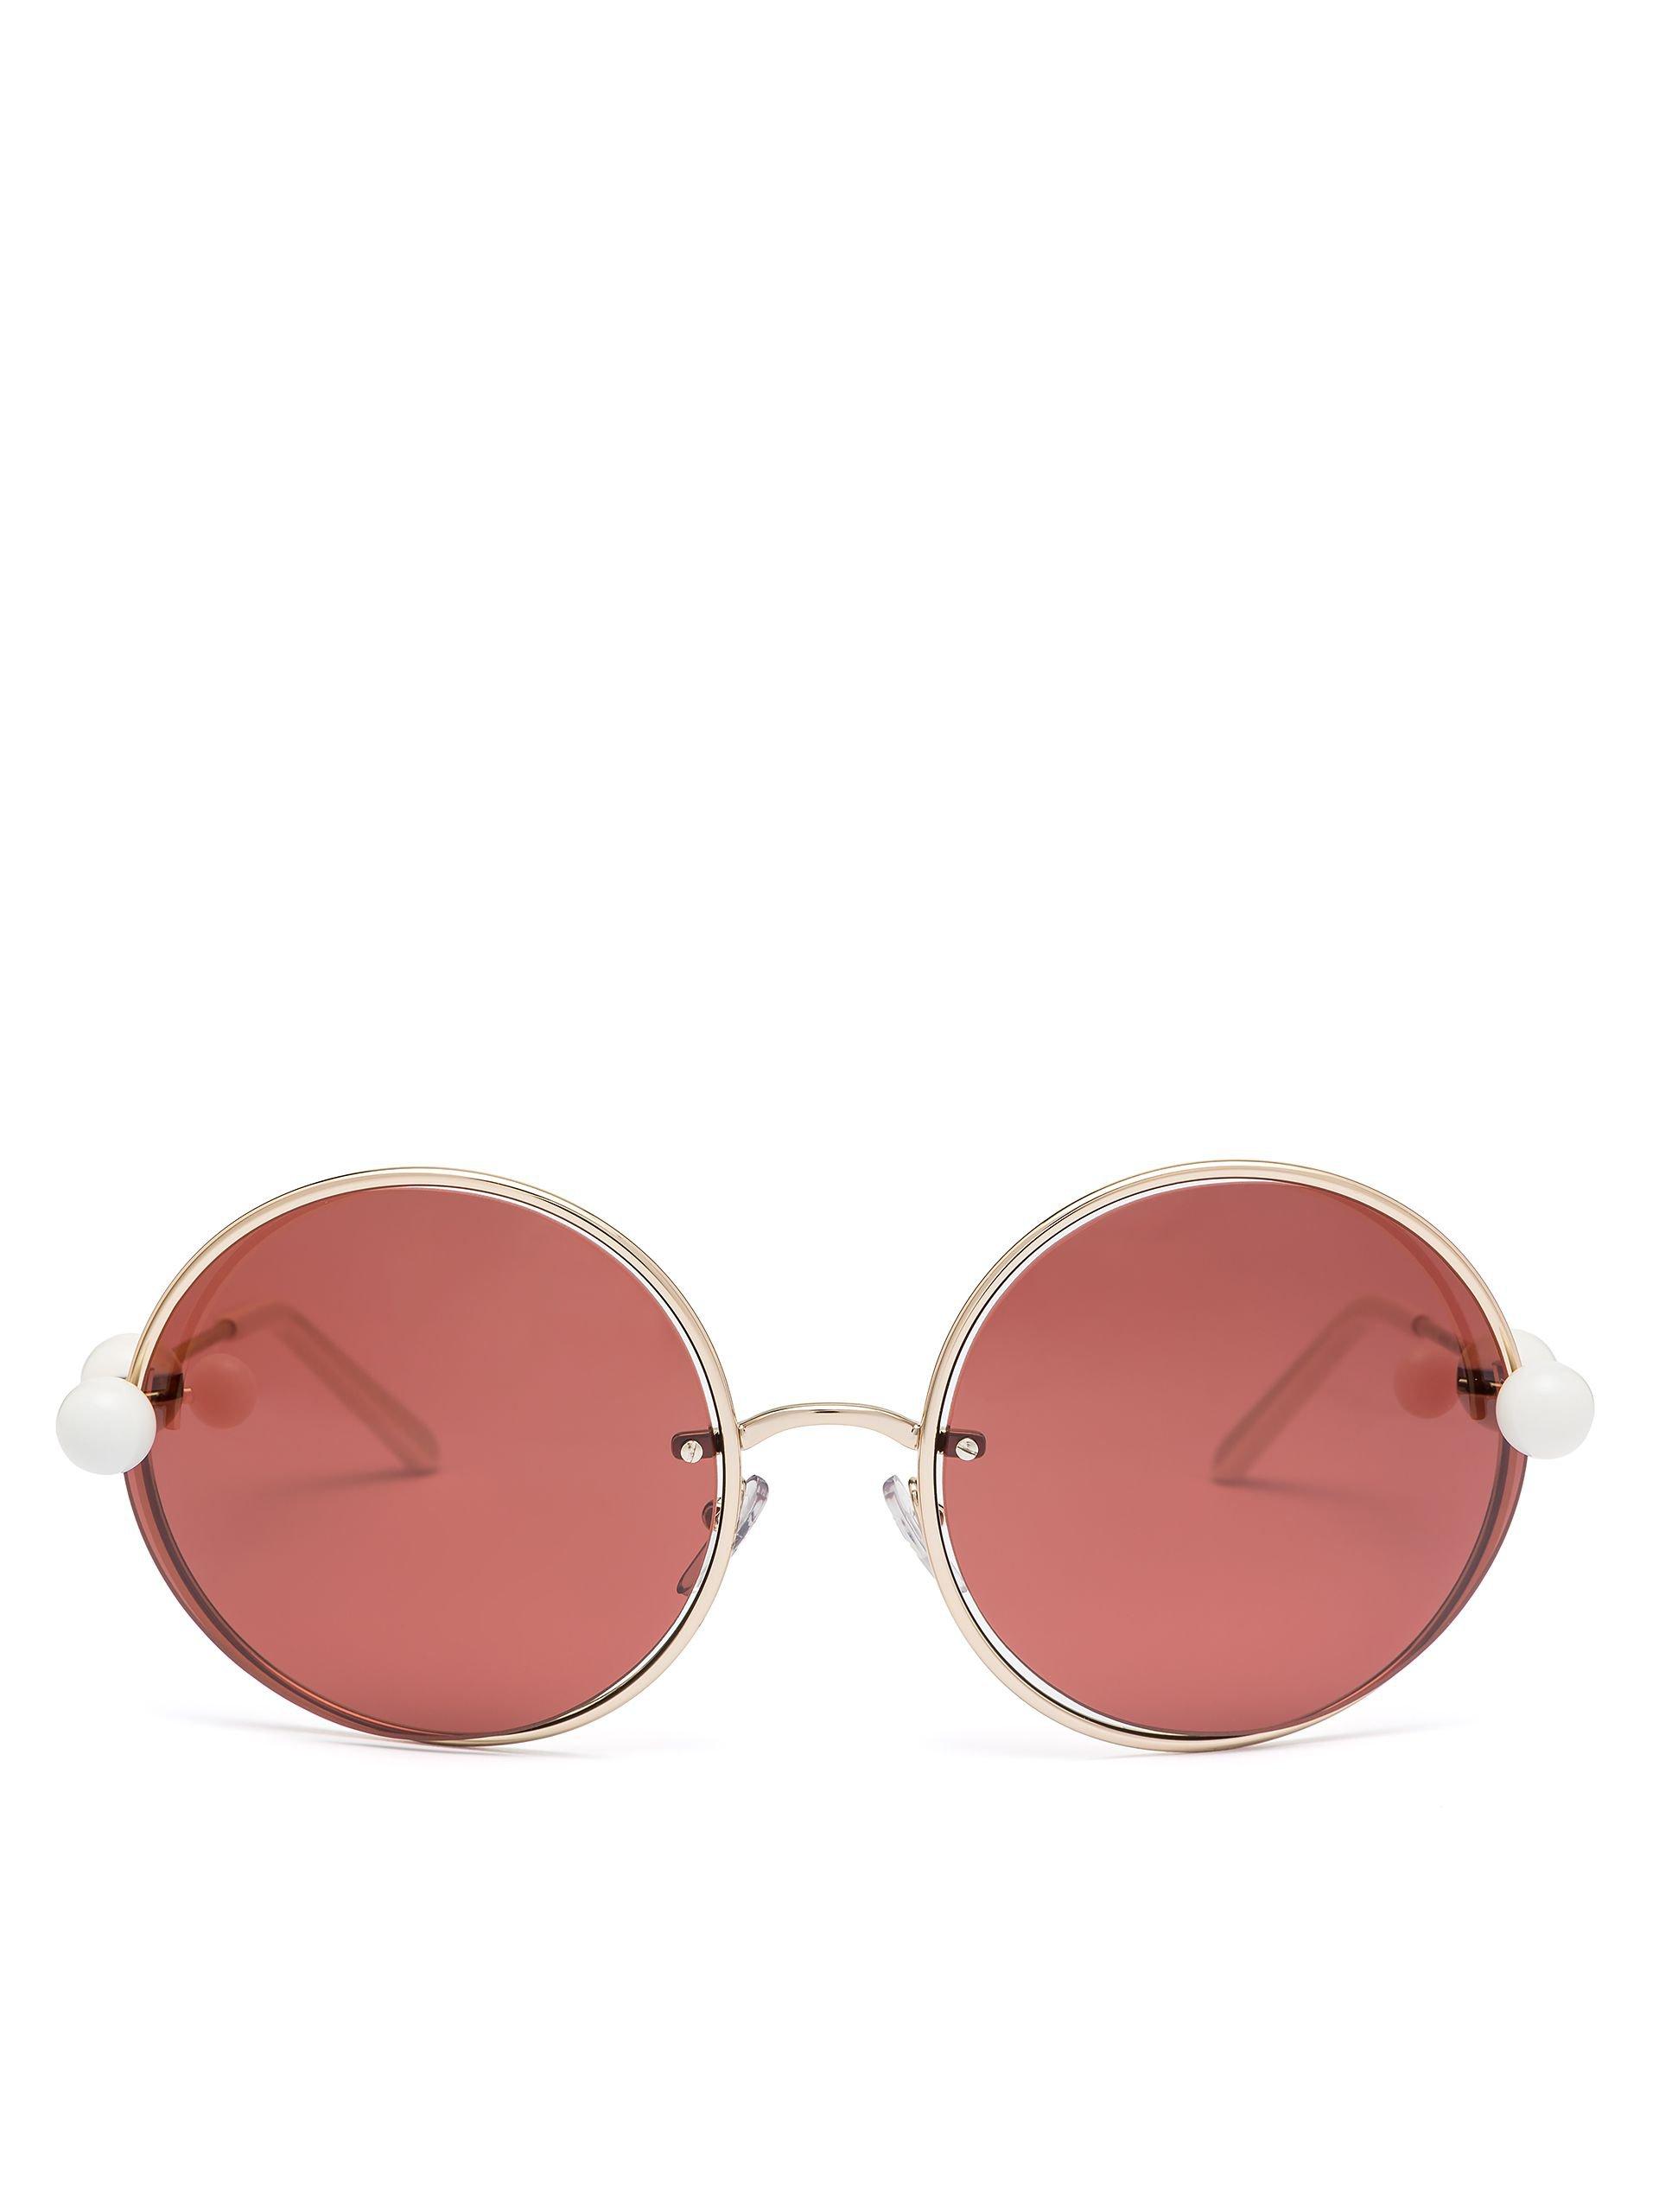 MARNI STARLIGHT Sunglasses In Metal  | Marni